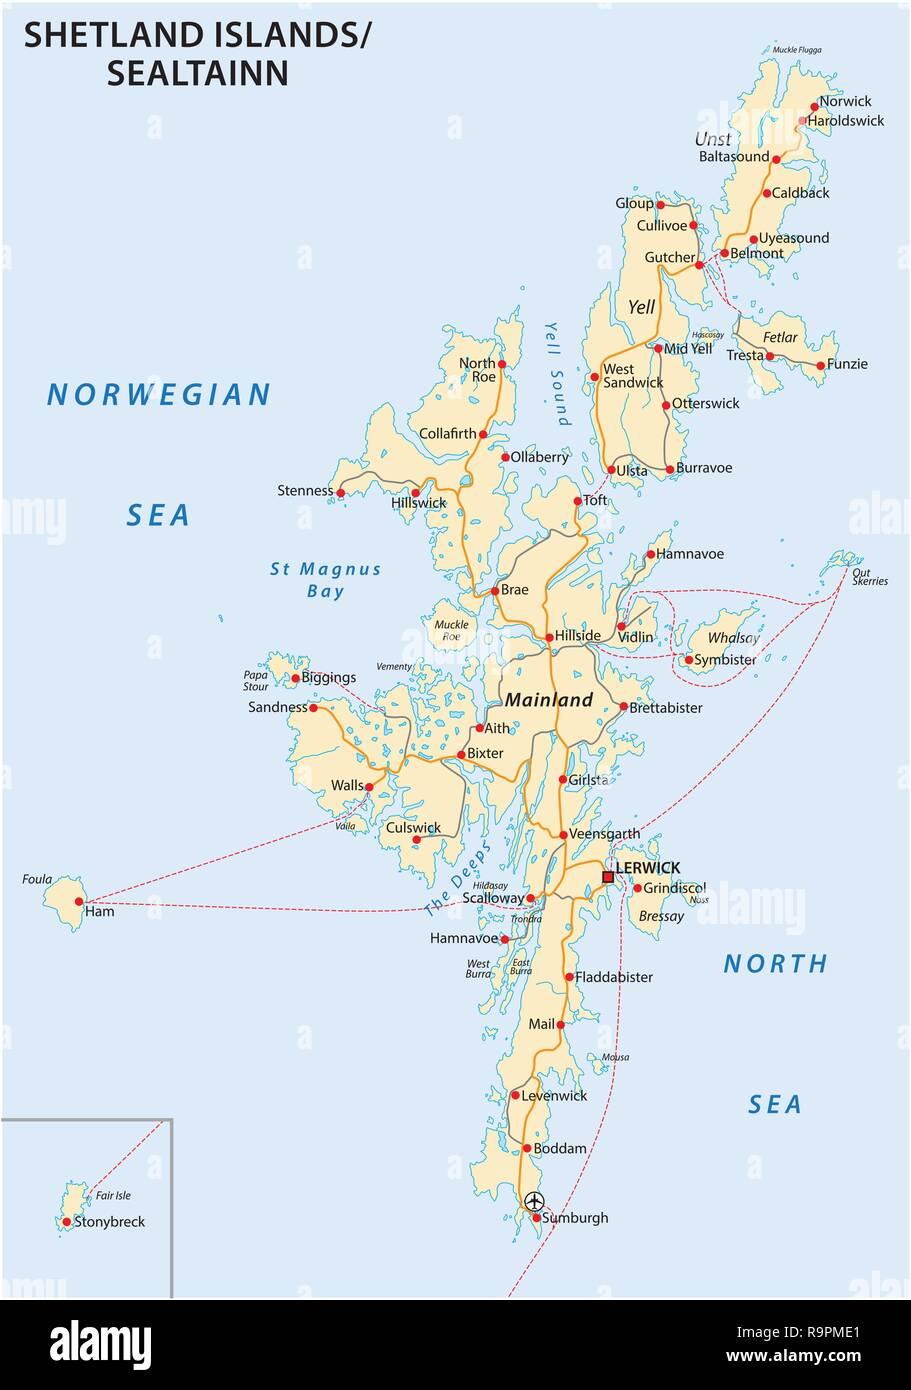 shetland islands road map, Scotland, United Kingdom - Stock Image